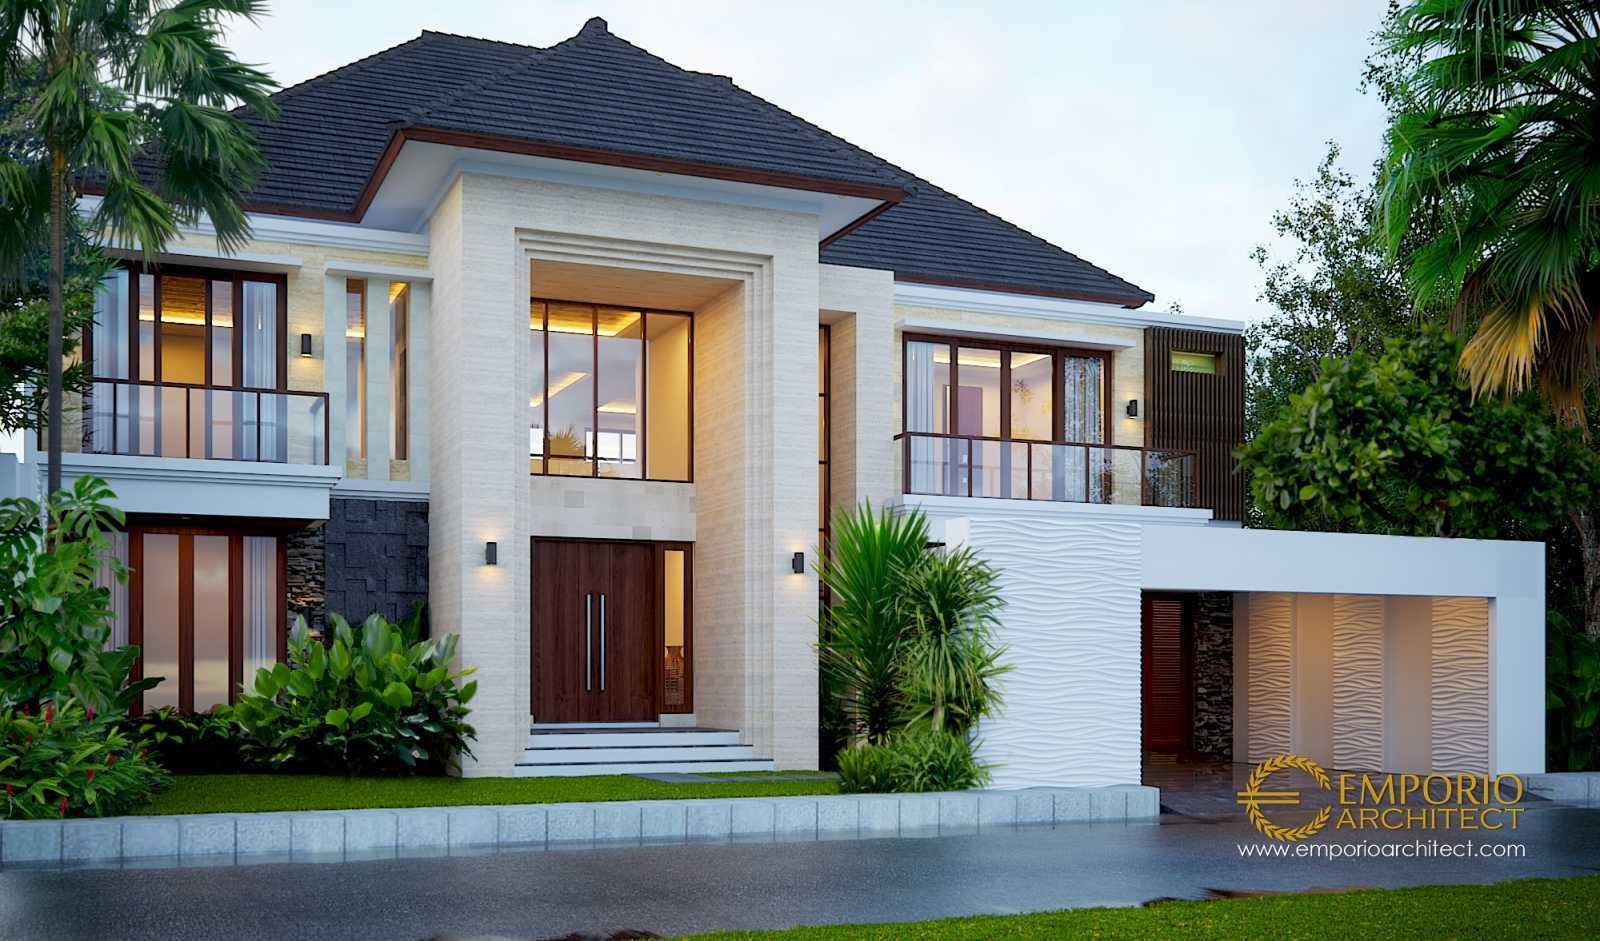 Emporio Architect Desain Rumah Modern Tropis 529 @ Sumatera Utara Sumatera Utara, Indonesia Sumatera Utara, Indonesia Emporio-Architect-Desain-Rumah-Modern-Tropis-529-Sumatera-Utara Modern  77959